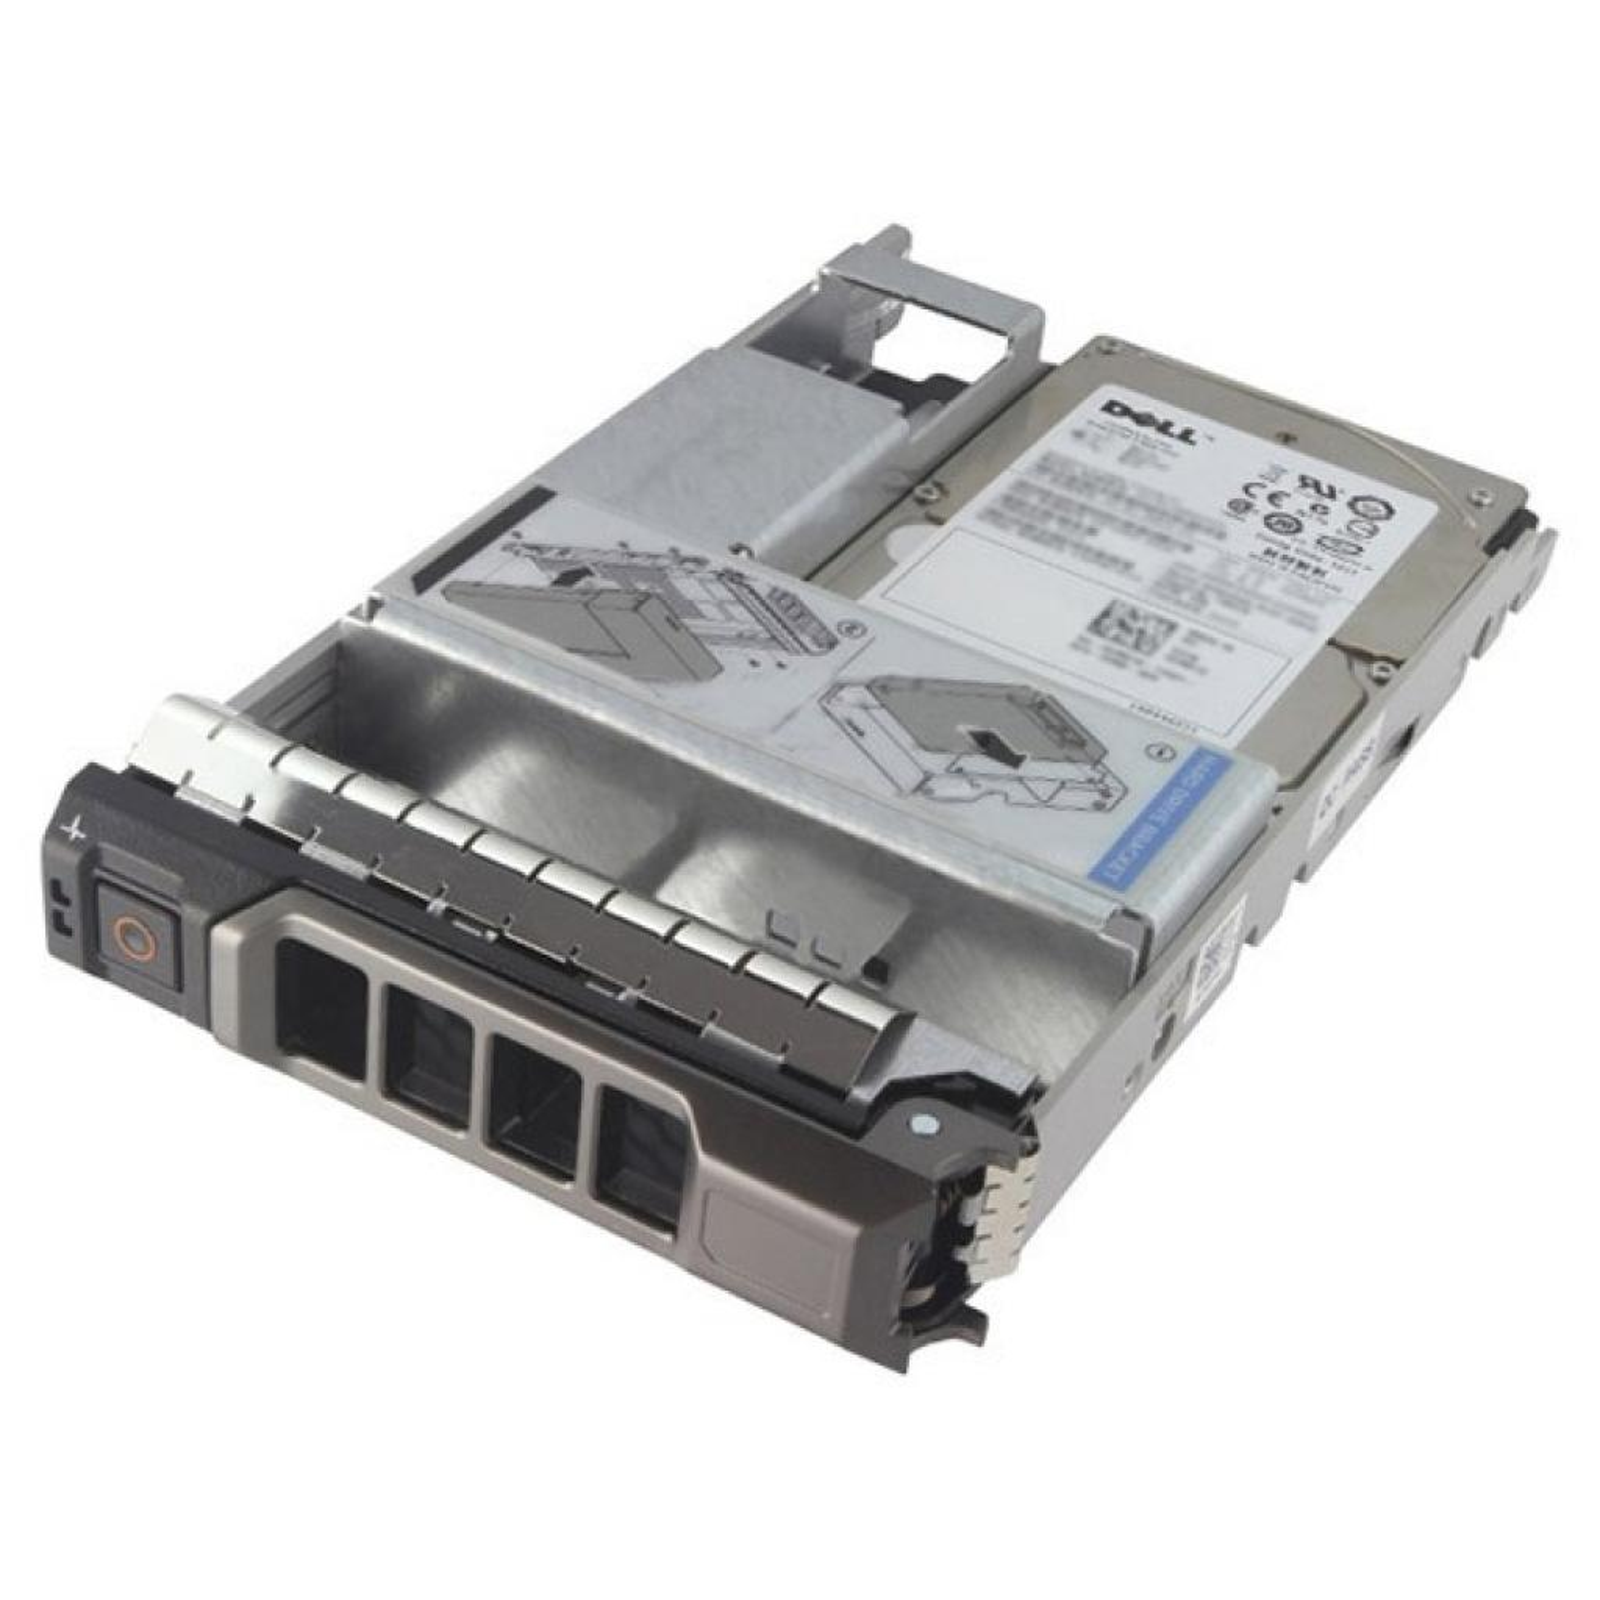 Жесткий диск для сервера Dell 600GB 10K RPM SAS 12Gbps (400-ASGT*)